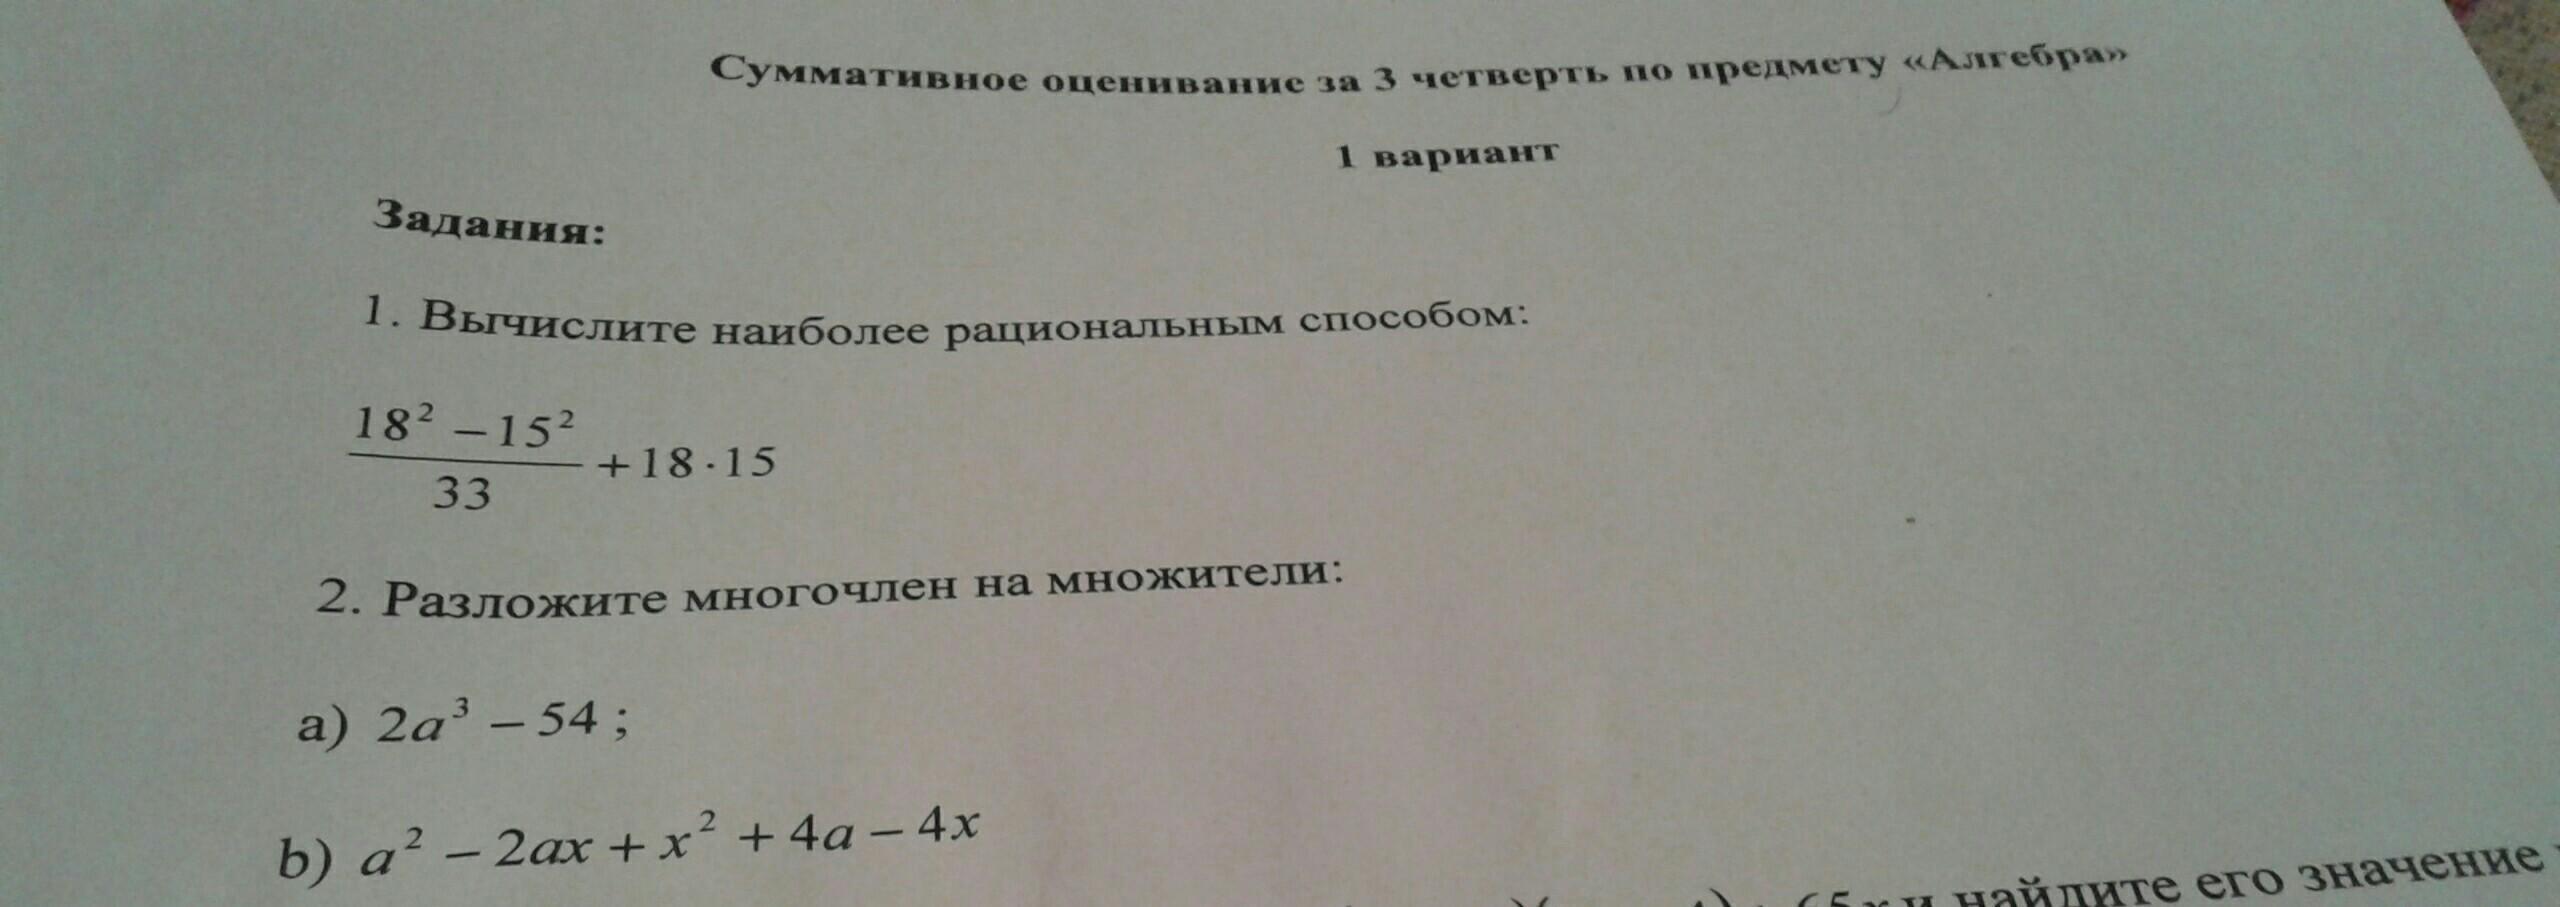 Соч по алгебре срочно 7 класс